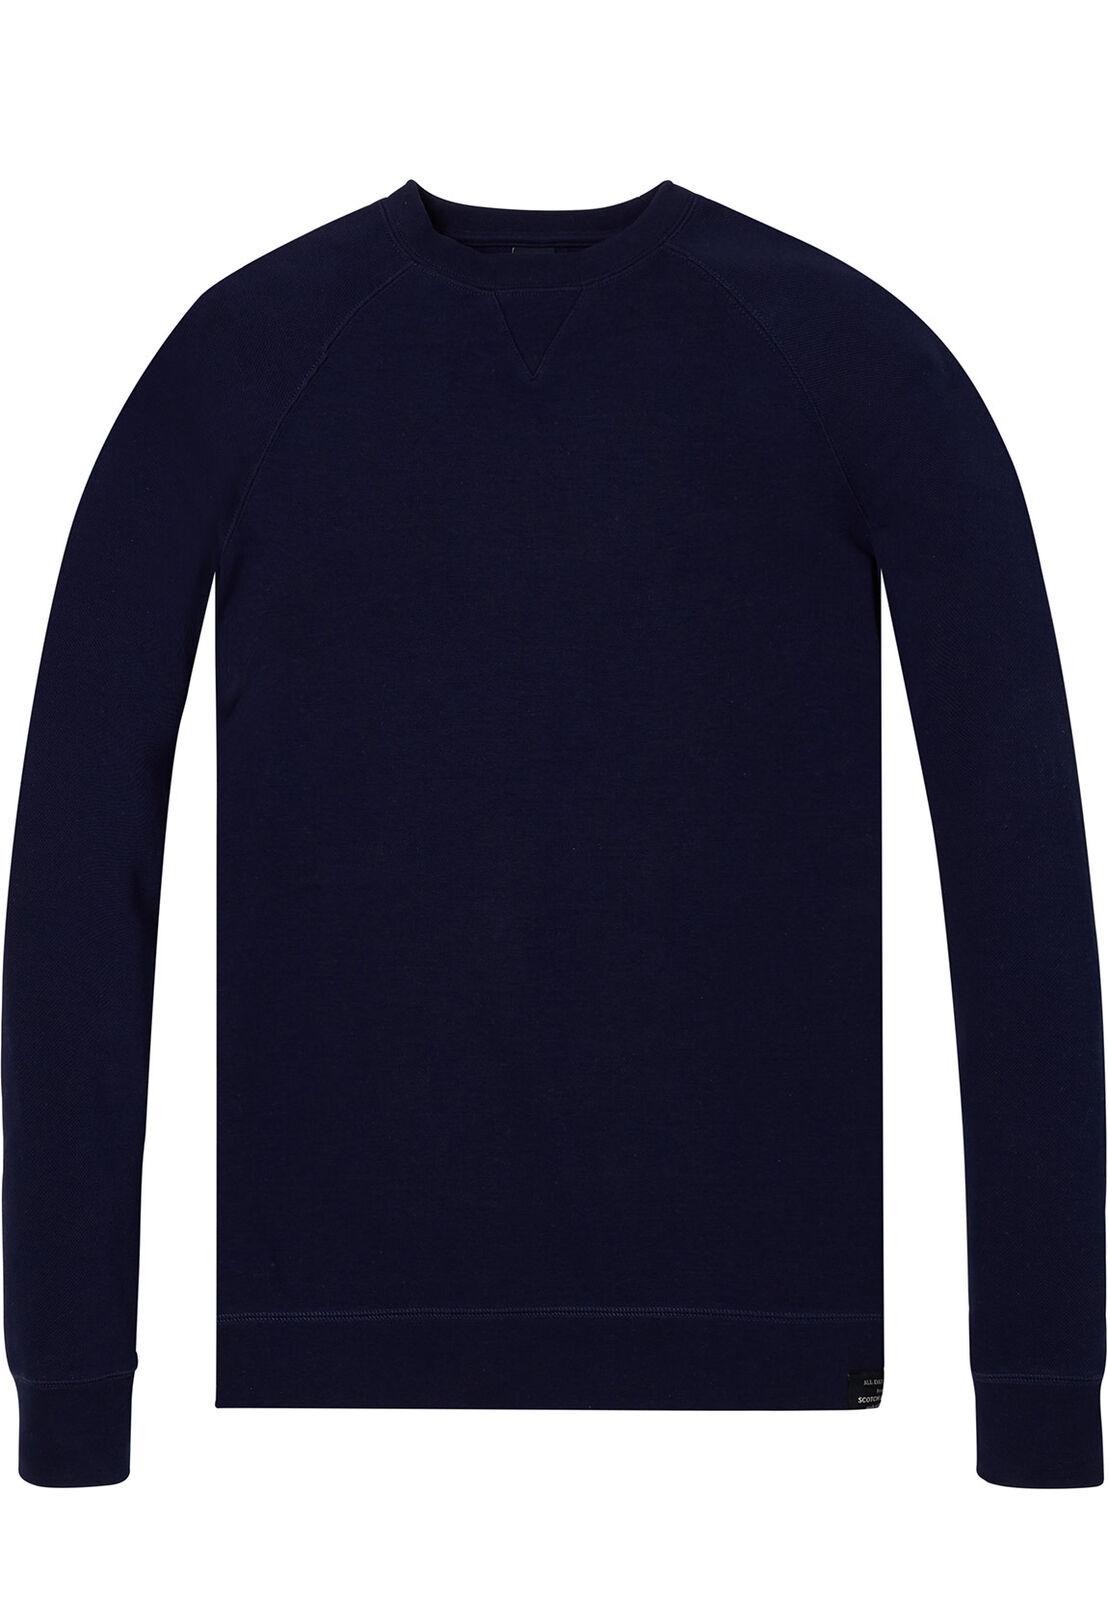 Scotch & Soda Basic Crewneck Sweater Men 142800 Denim Blau 0155 Blau